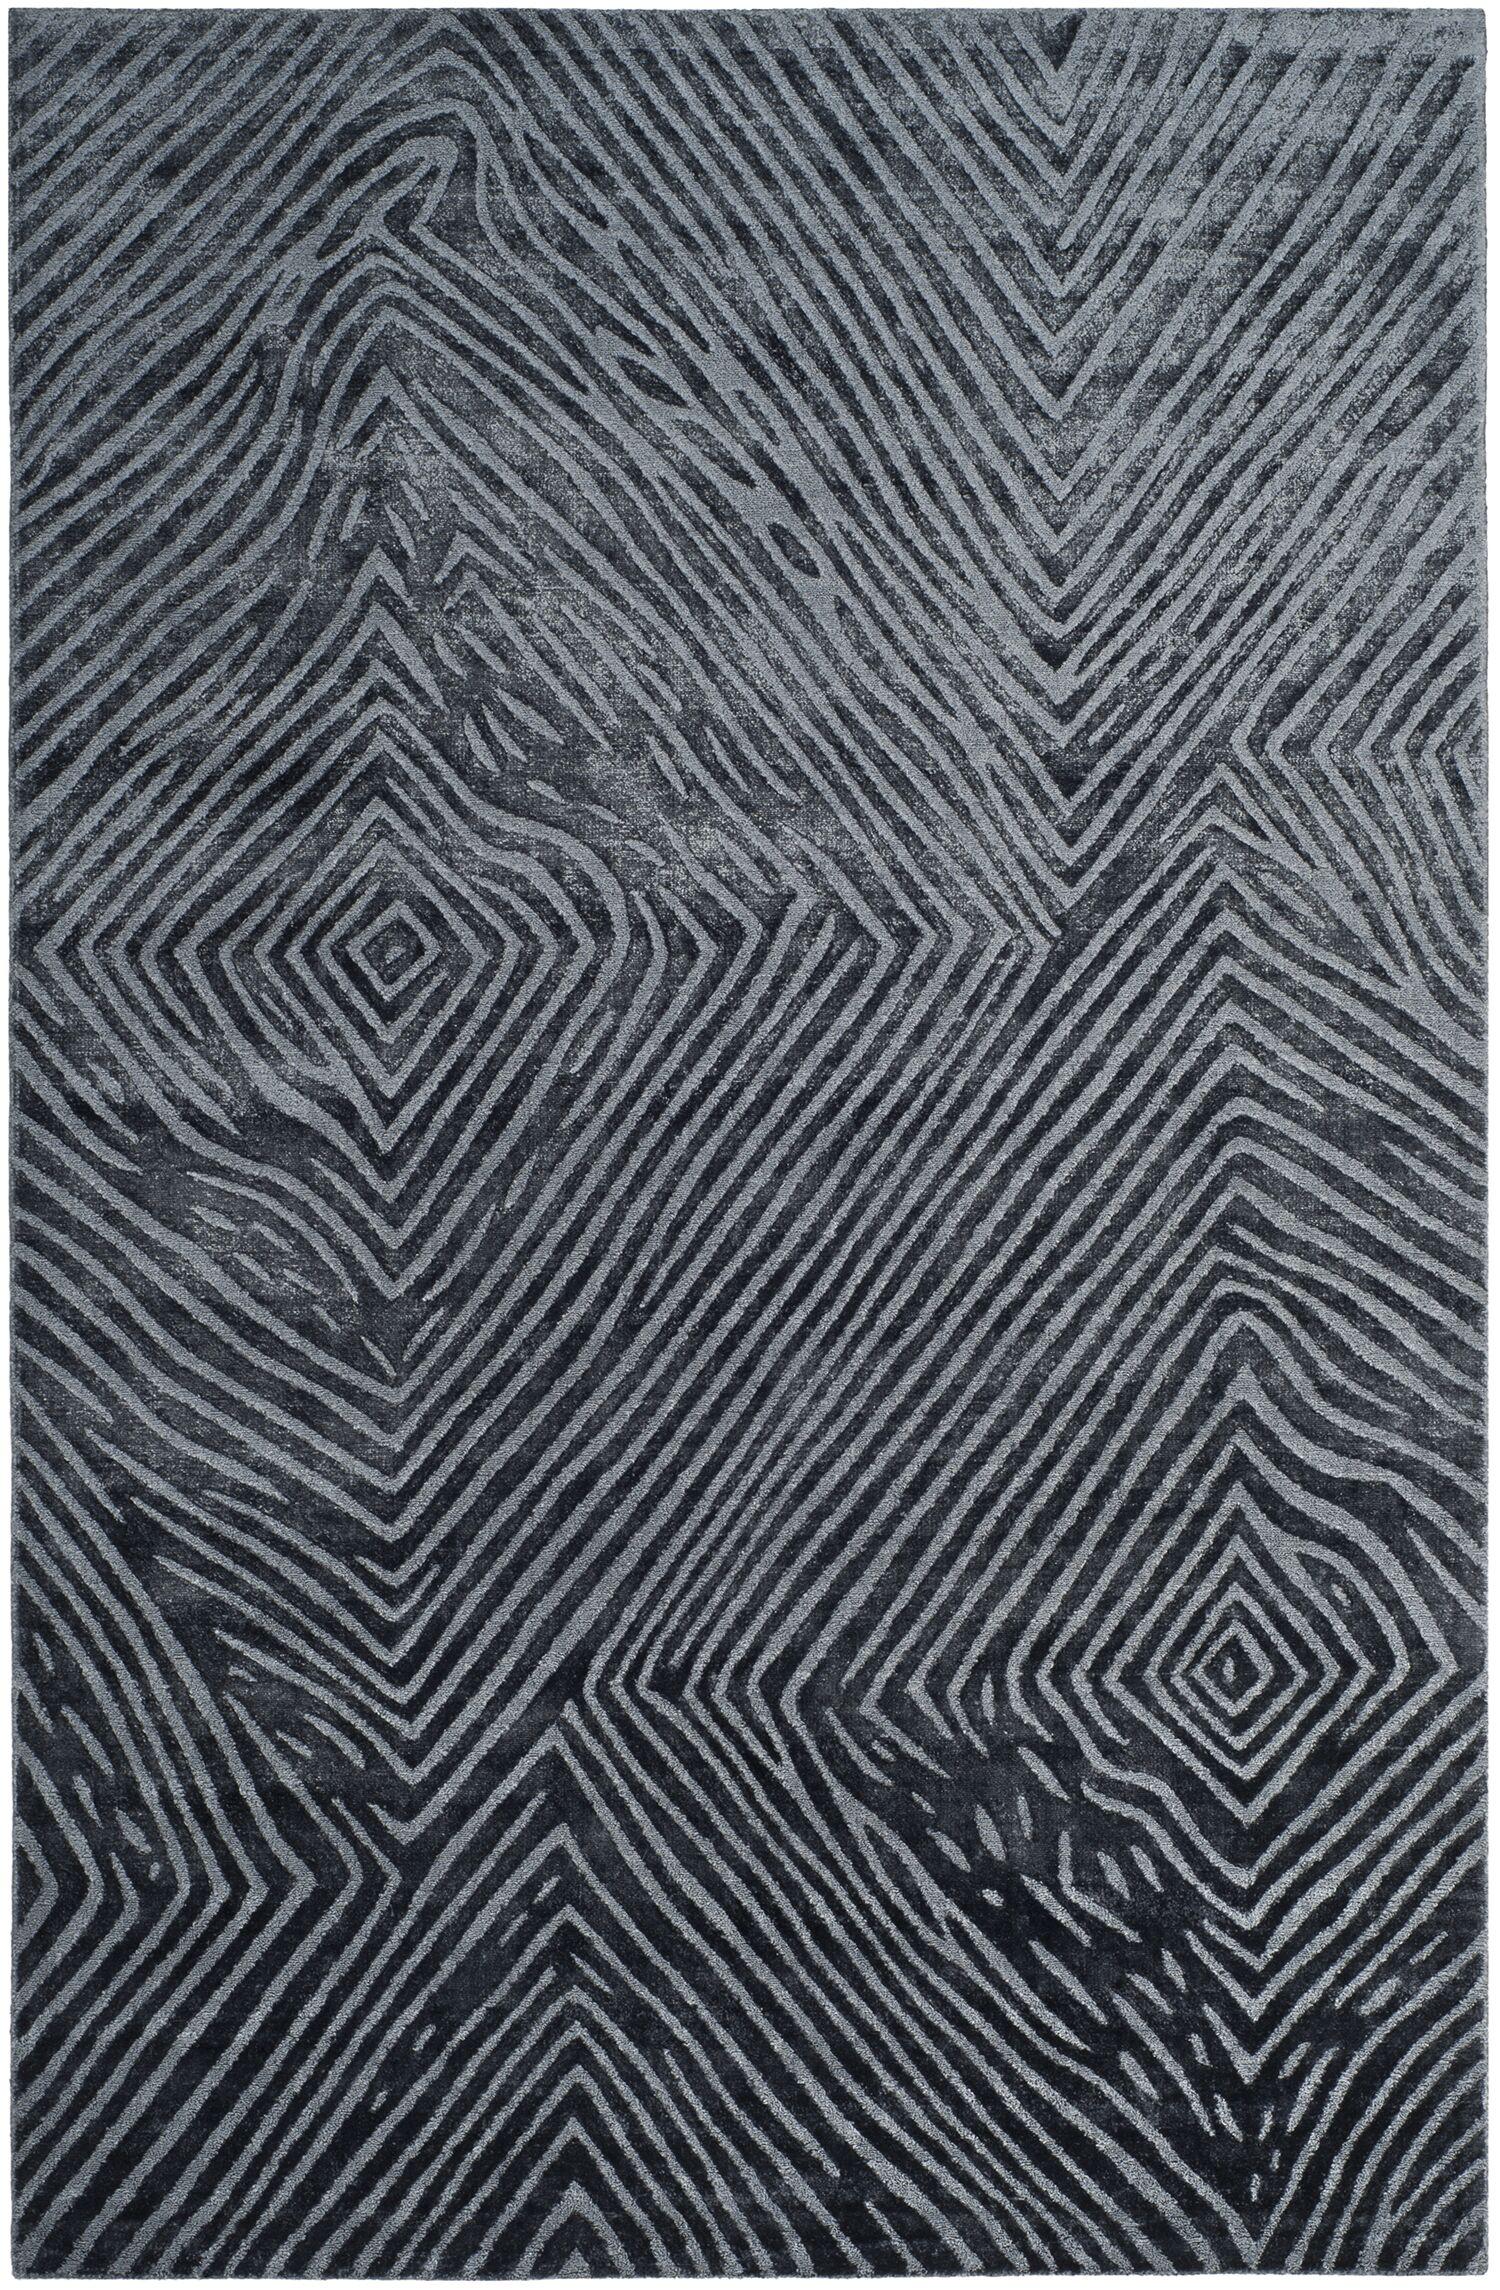 Moorhouse Hand-Woven Blue/Gray Area Rug Rug Size: Rectangle 6' x 9'